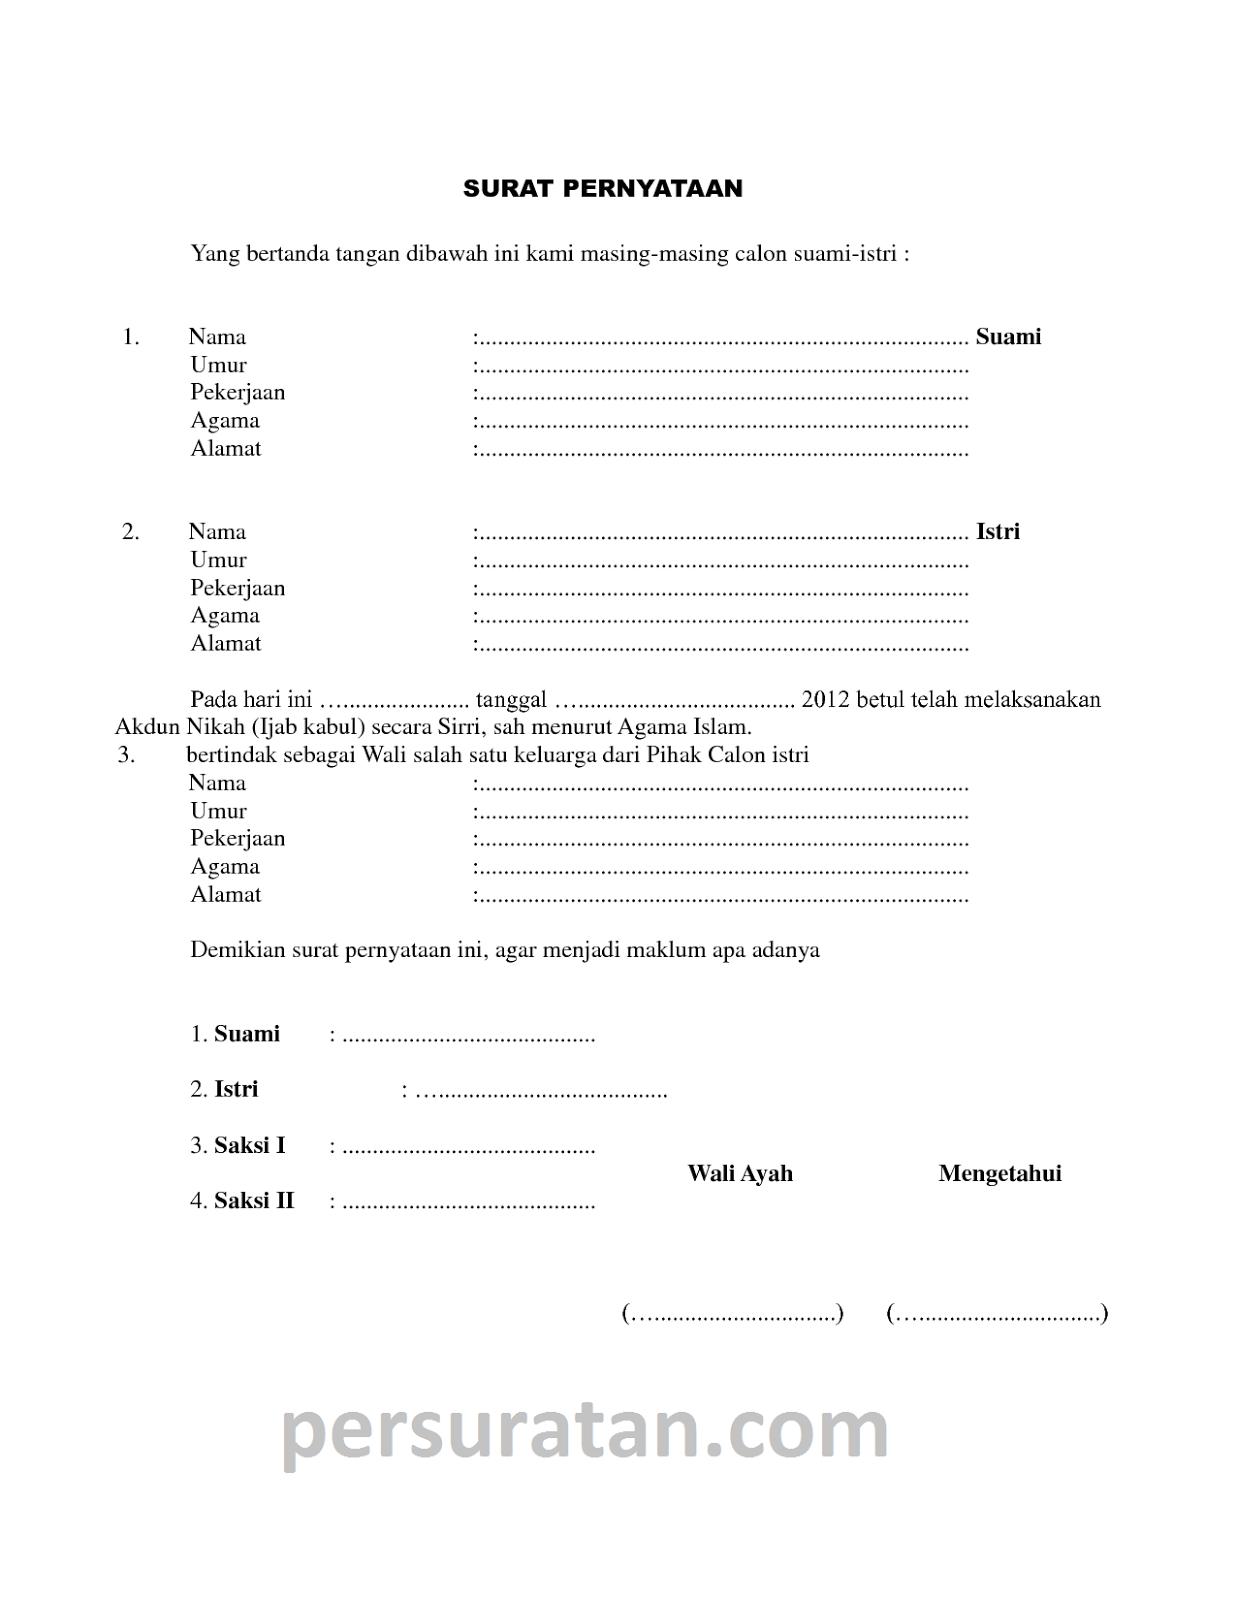 Contoh Format Surat Nikah Siri